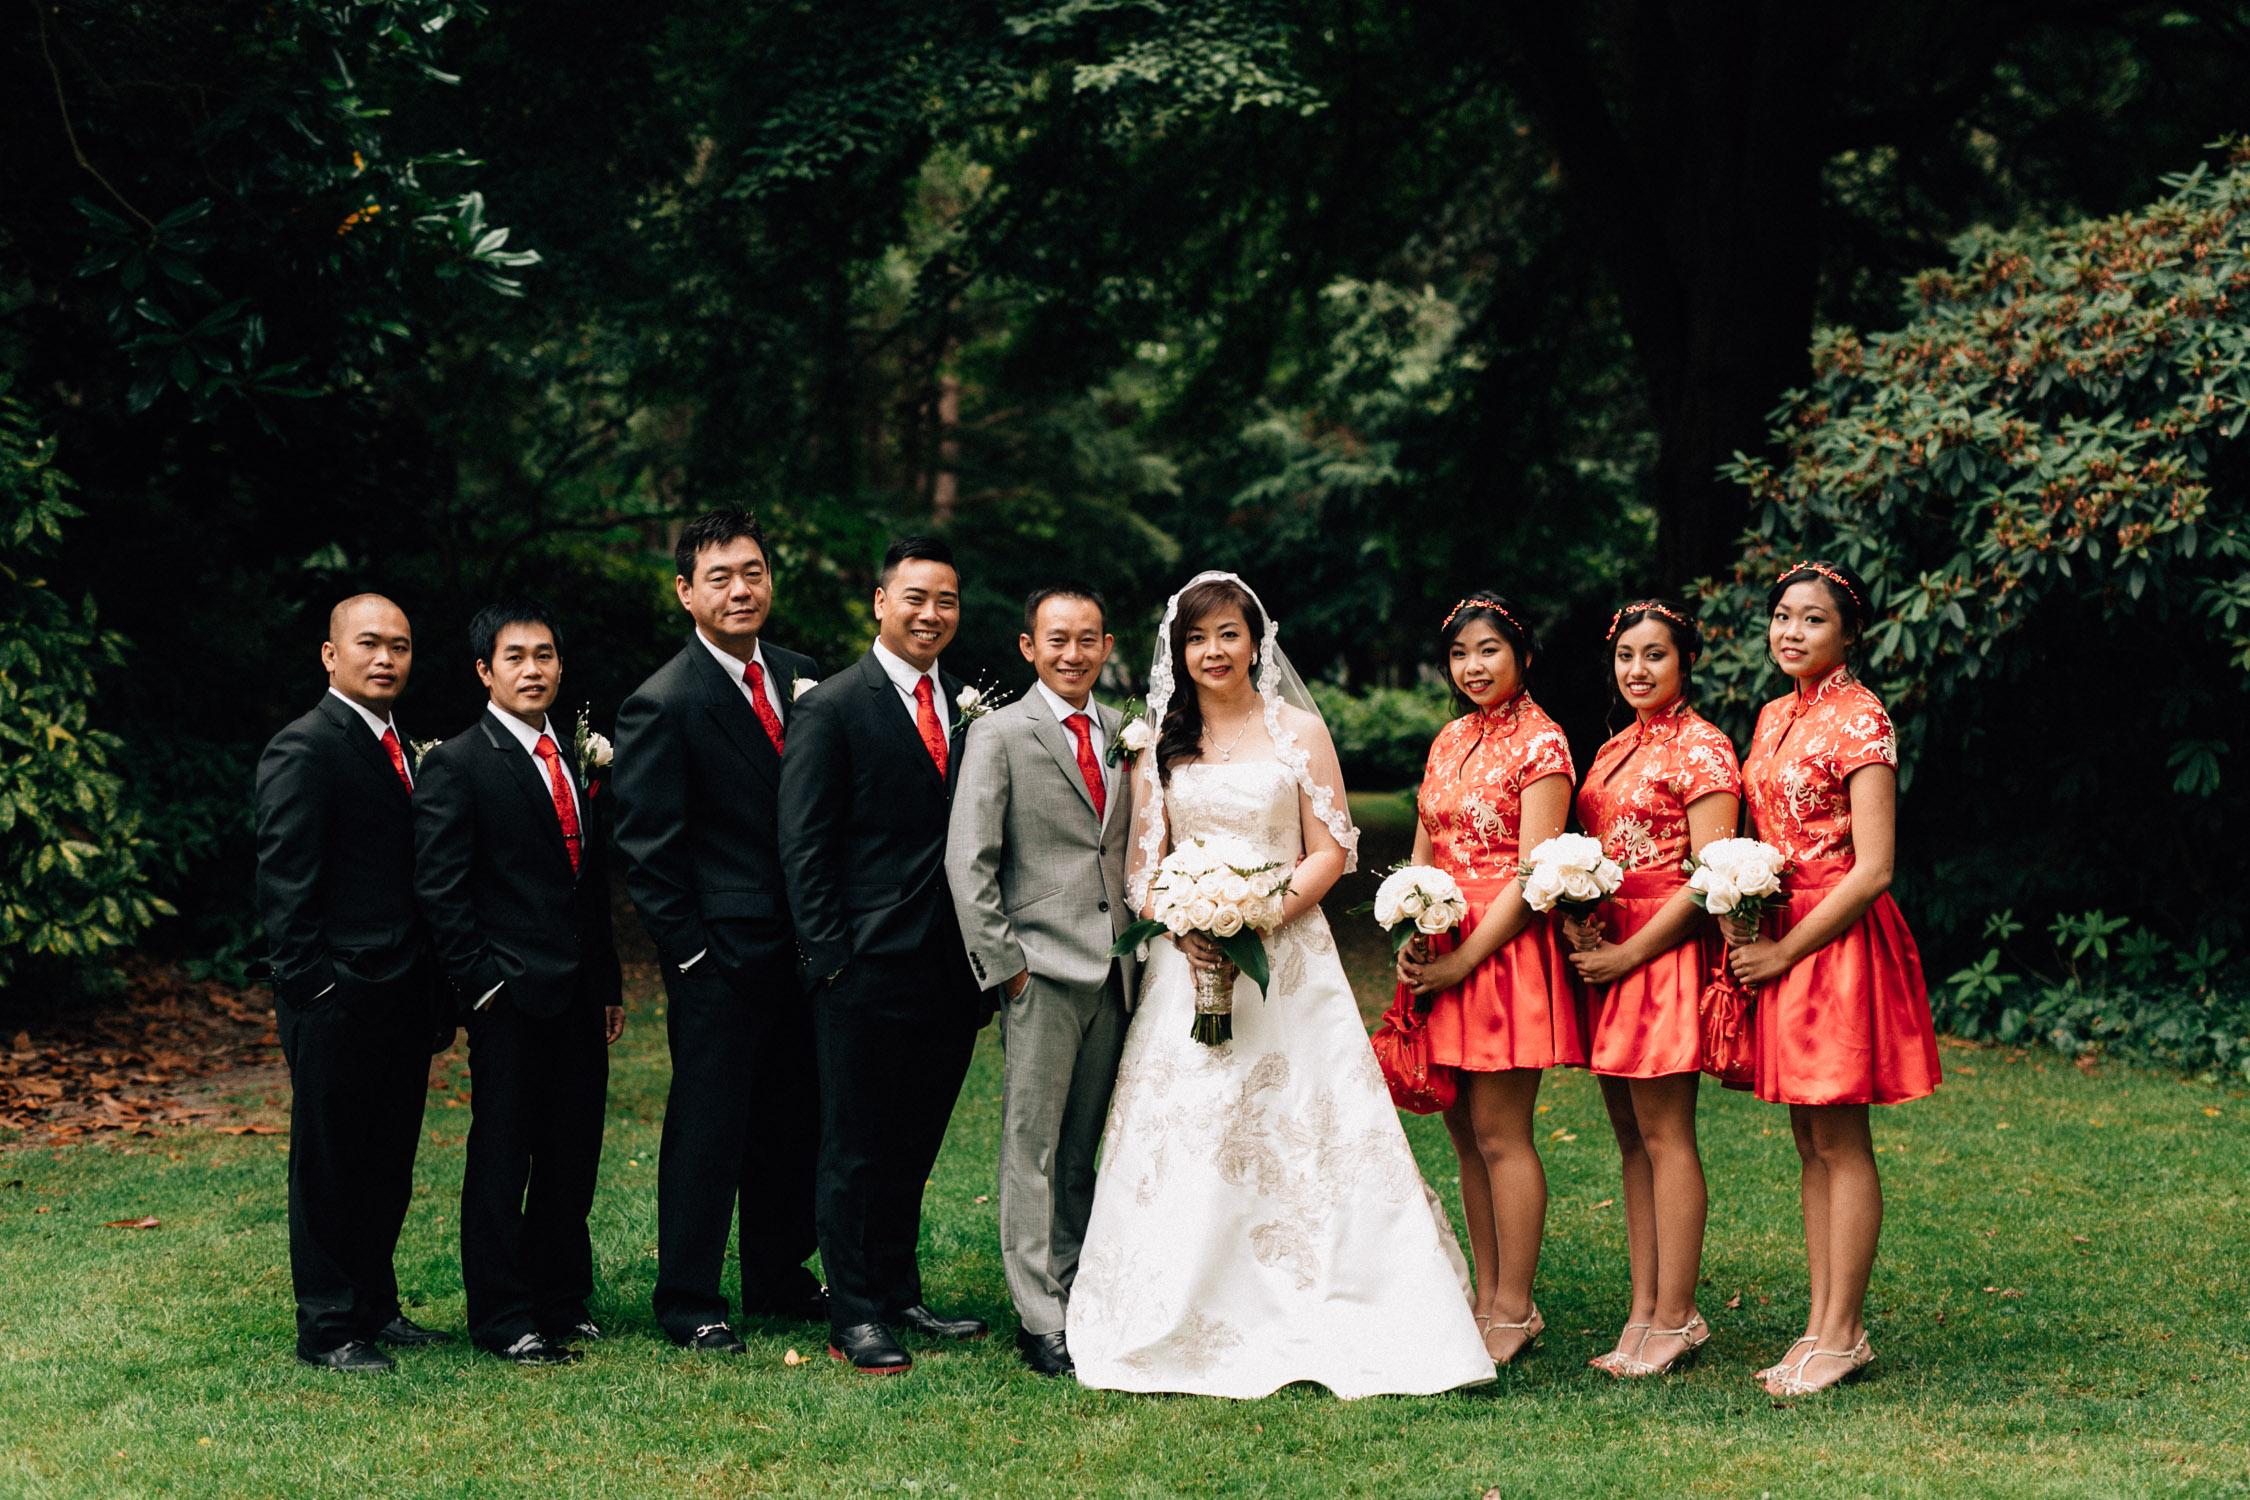 bridal party at minoru park in richmond wedding photography